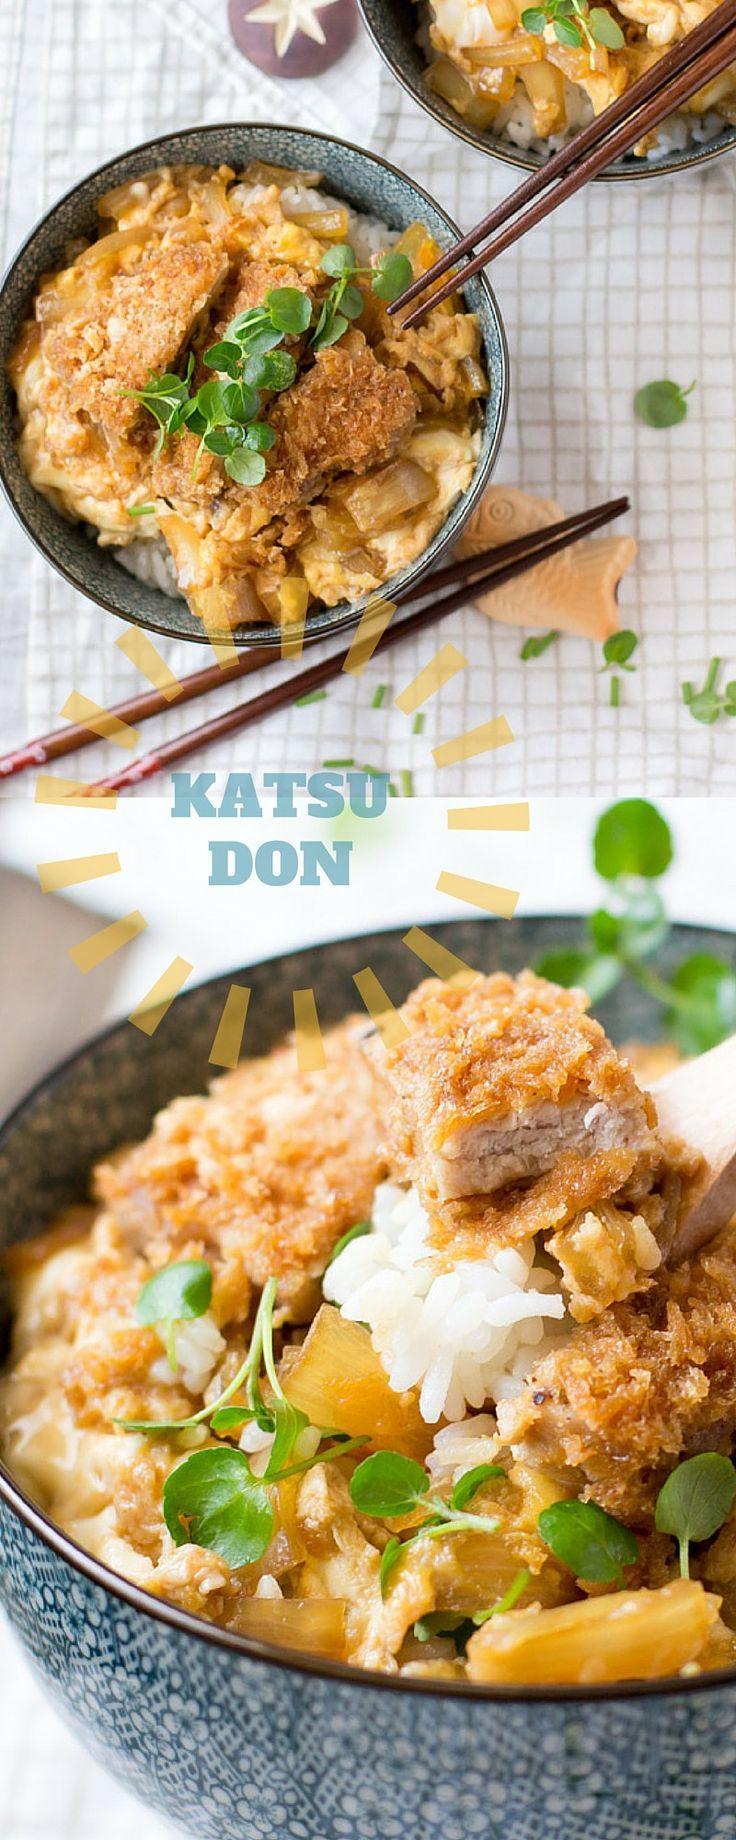 Mer enn 20 bra ideer om japanese dishes p pinterest katsudon fried pork rice bowl katsudon is a delicious japanese dish forumfinder Gallery